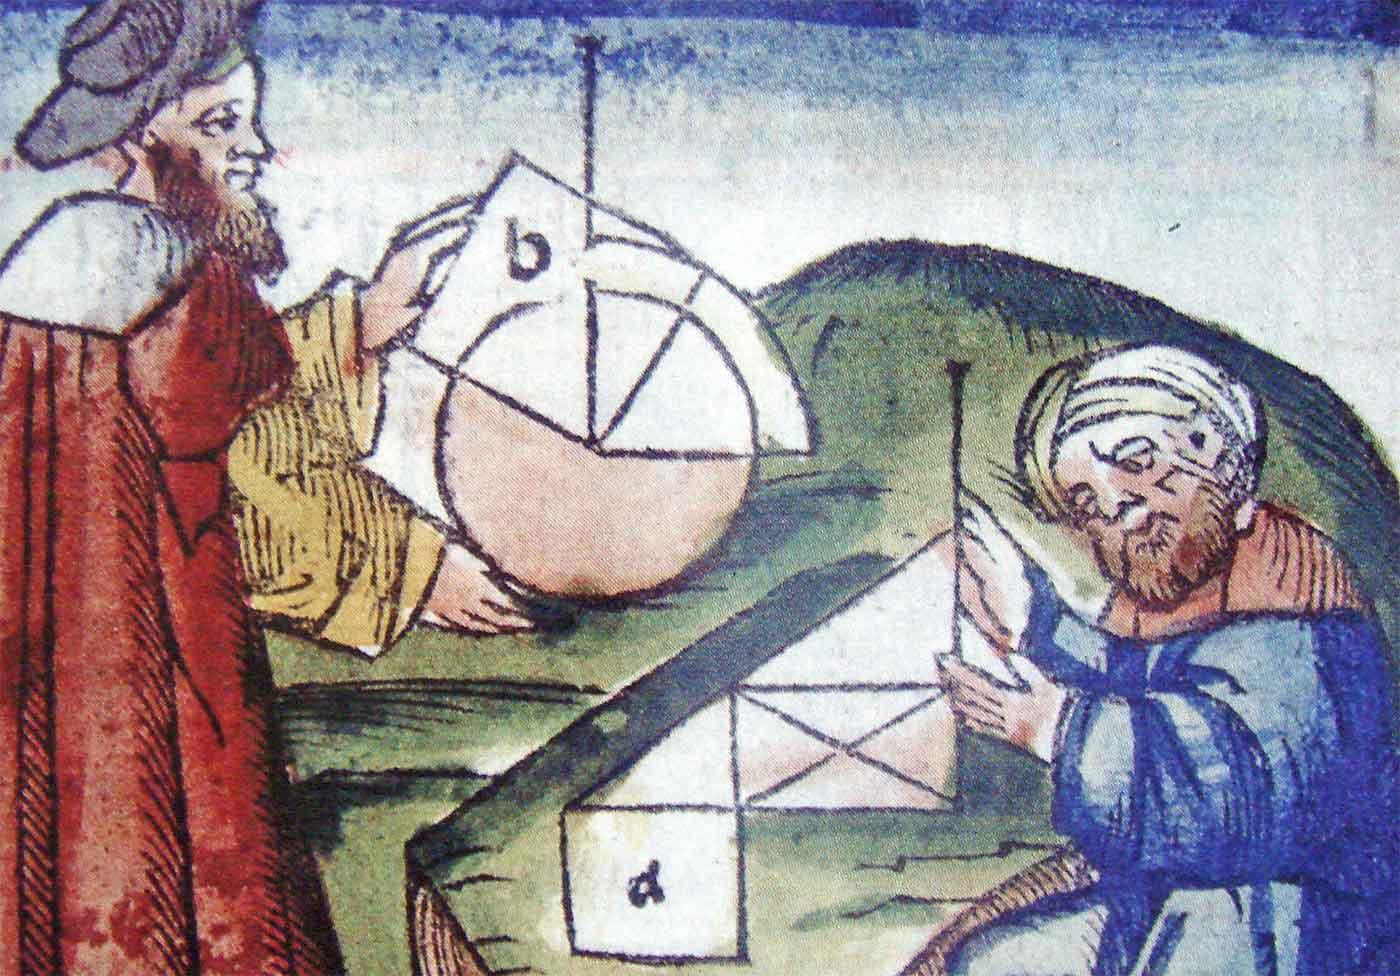 Practicing geometry 15th century manuscript